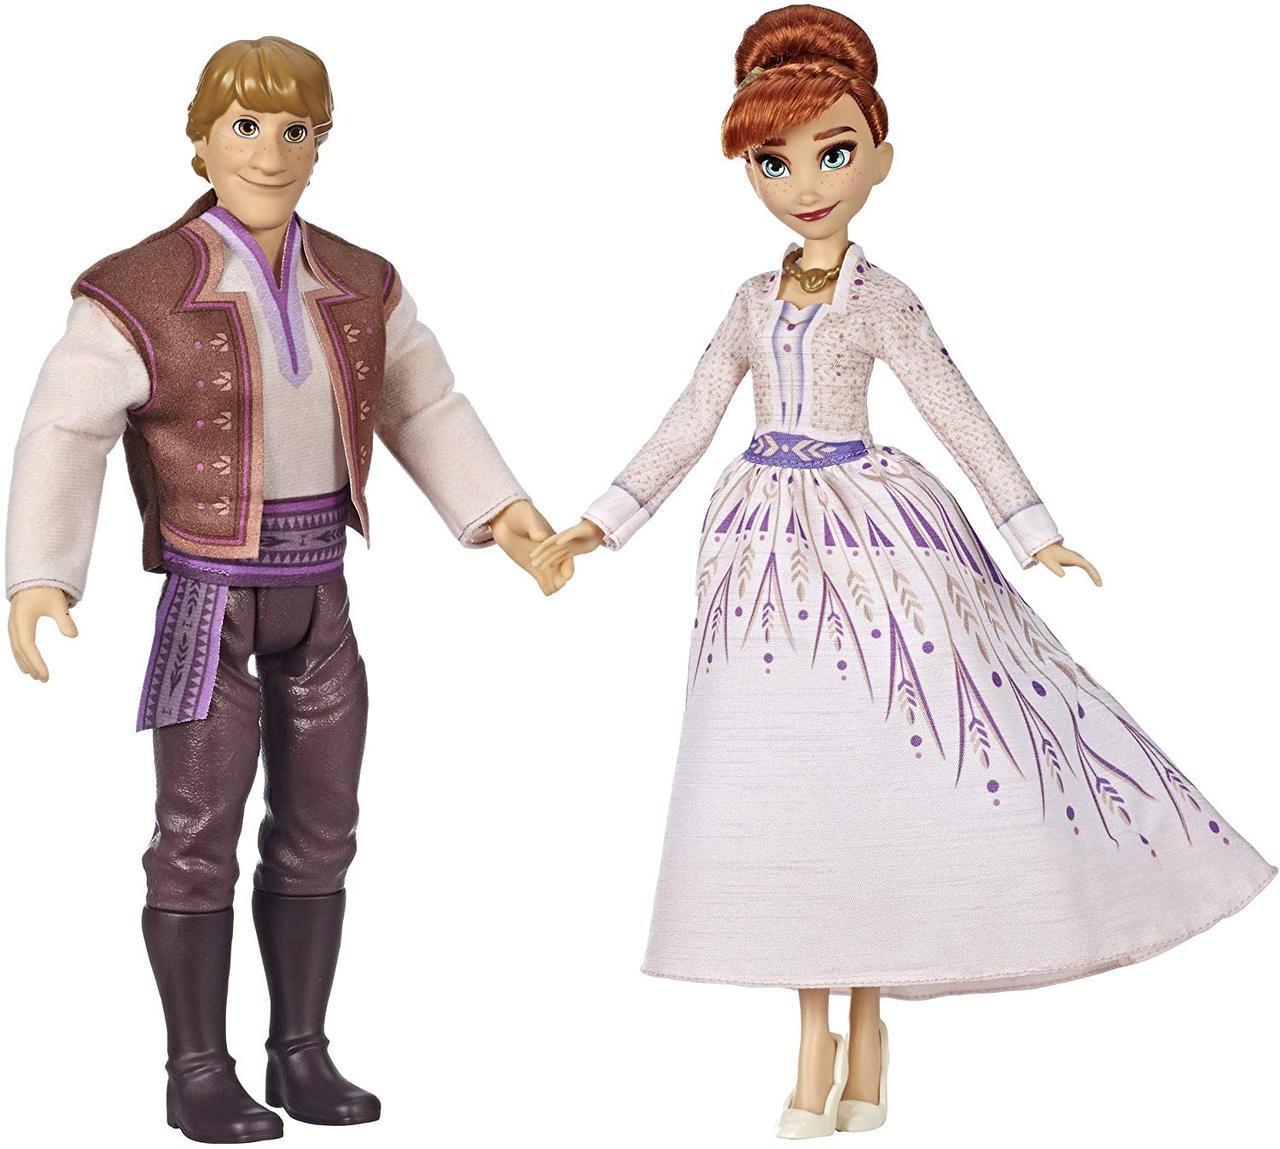 Холодное сердце 2 Кукла Анна и Кристоф Хасбро Disney Frozen 2 Anna and Kristoff